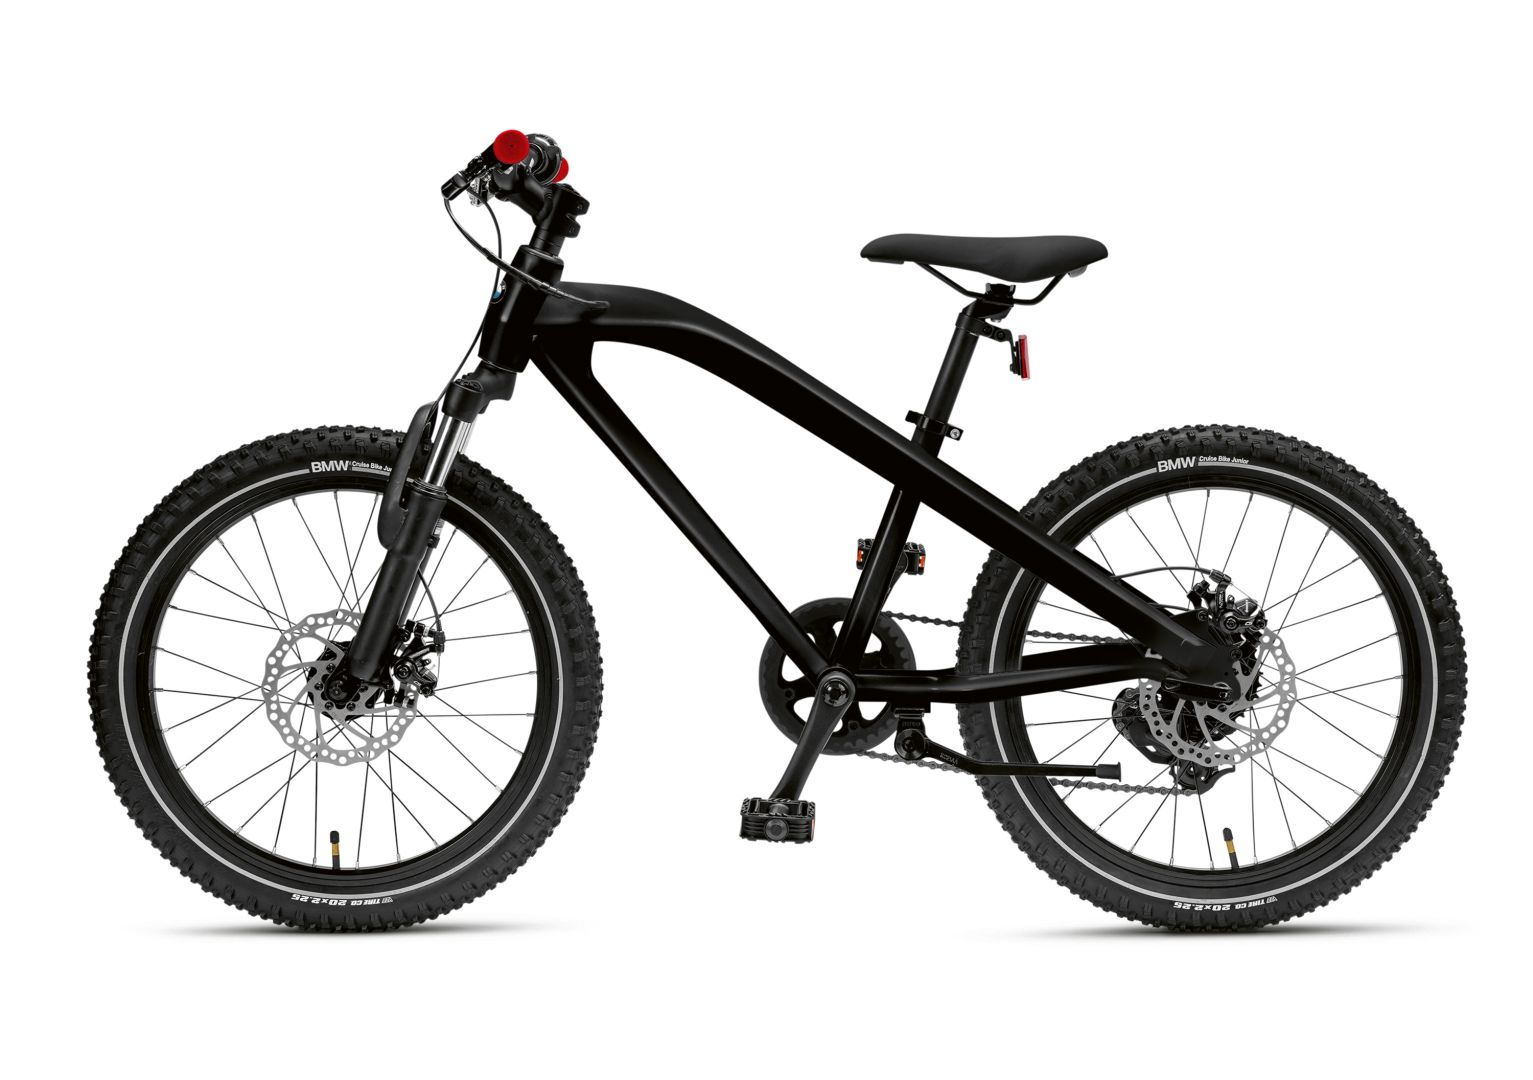 Photo Gallery Bmw Announces New Bike Range Including